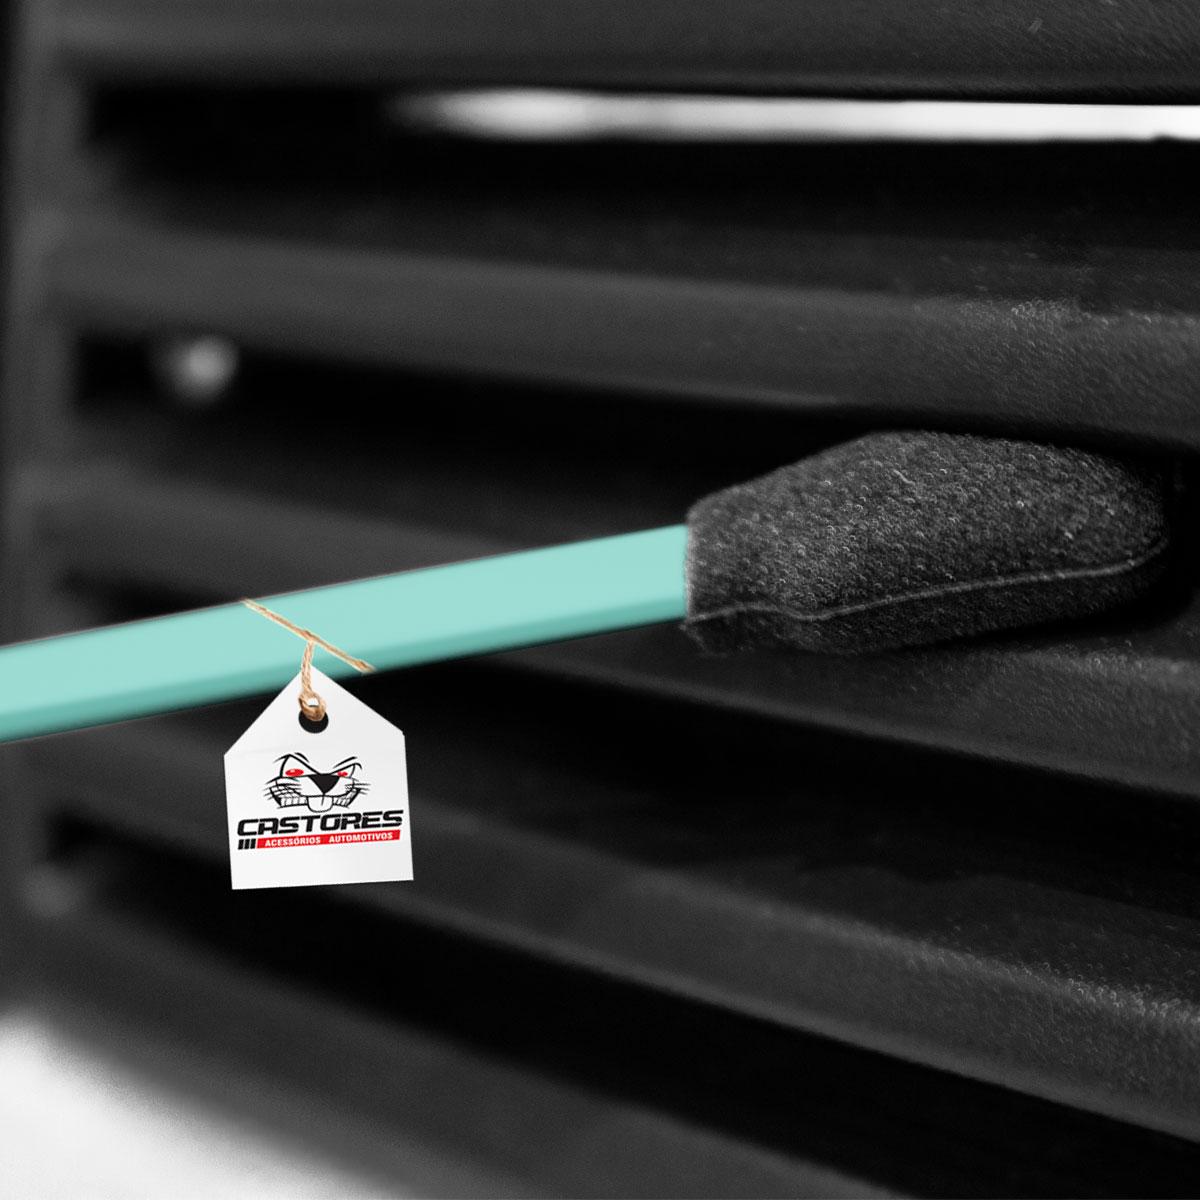 Mini Stick Detailer - Acabamento Interno e Externo